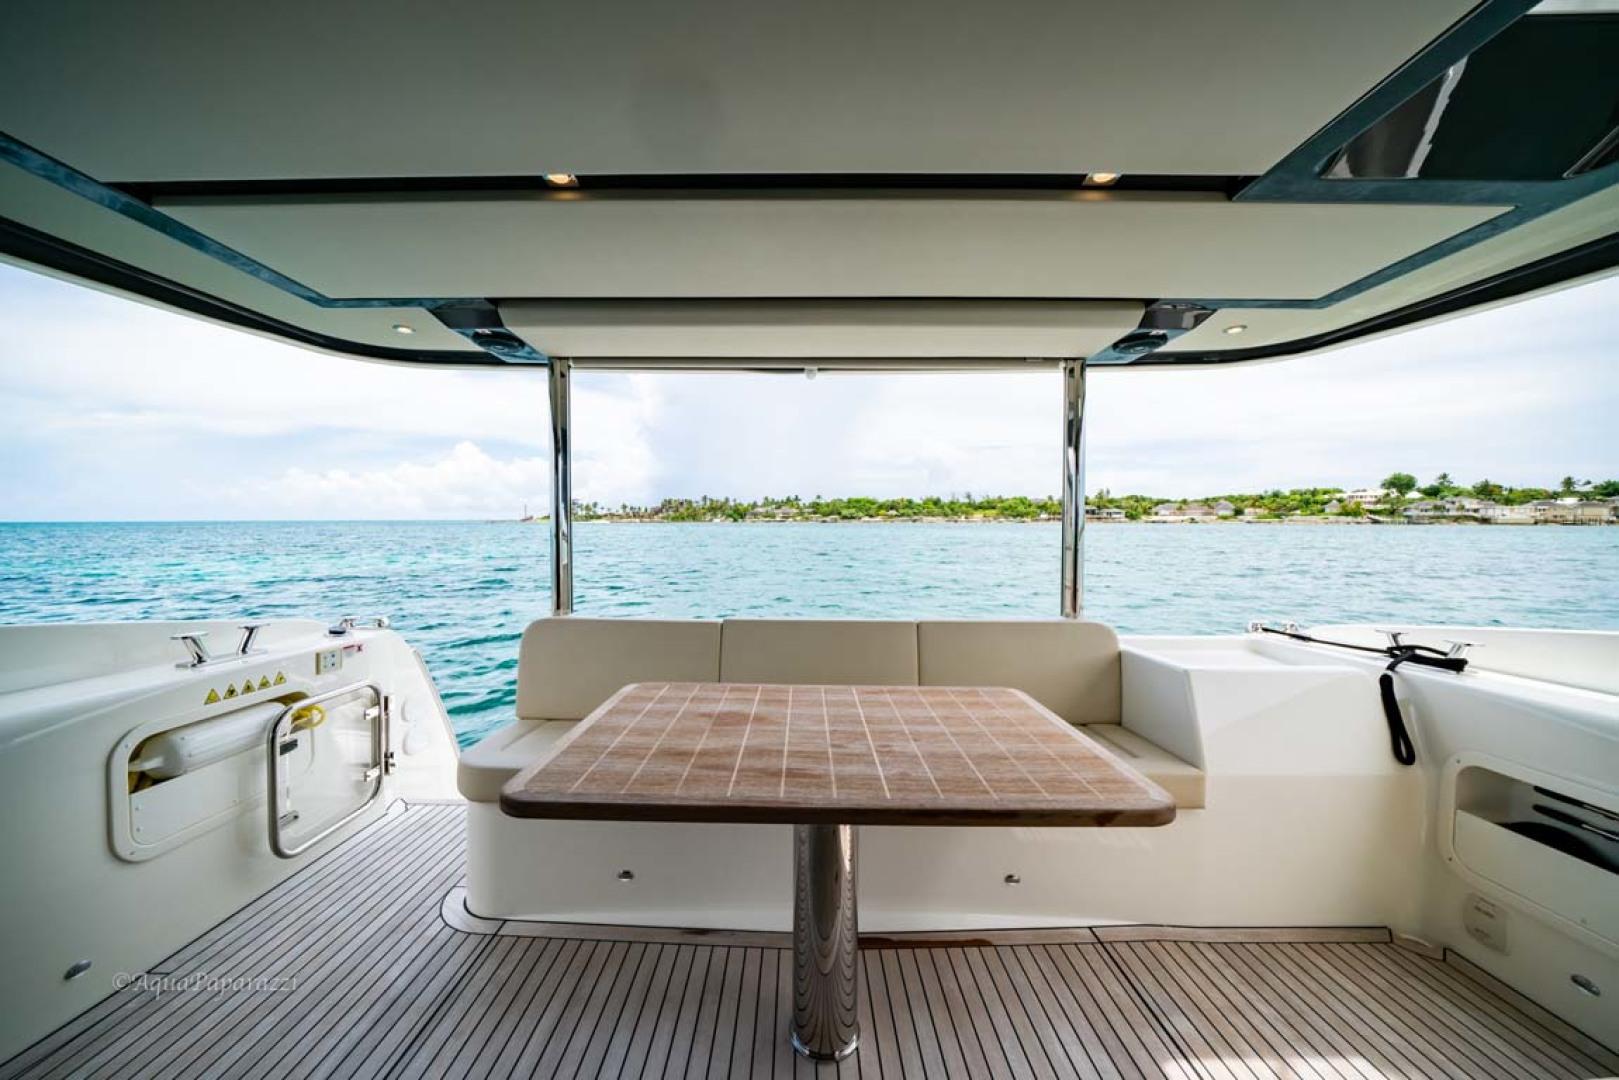 Absolute-52 Navetta 2017-Ohana North Palm Beach-Florida-United States-Aft Deck-1189366 | Thumbnail